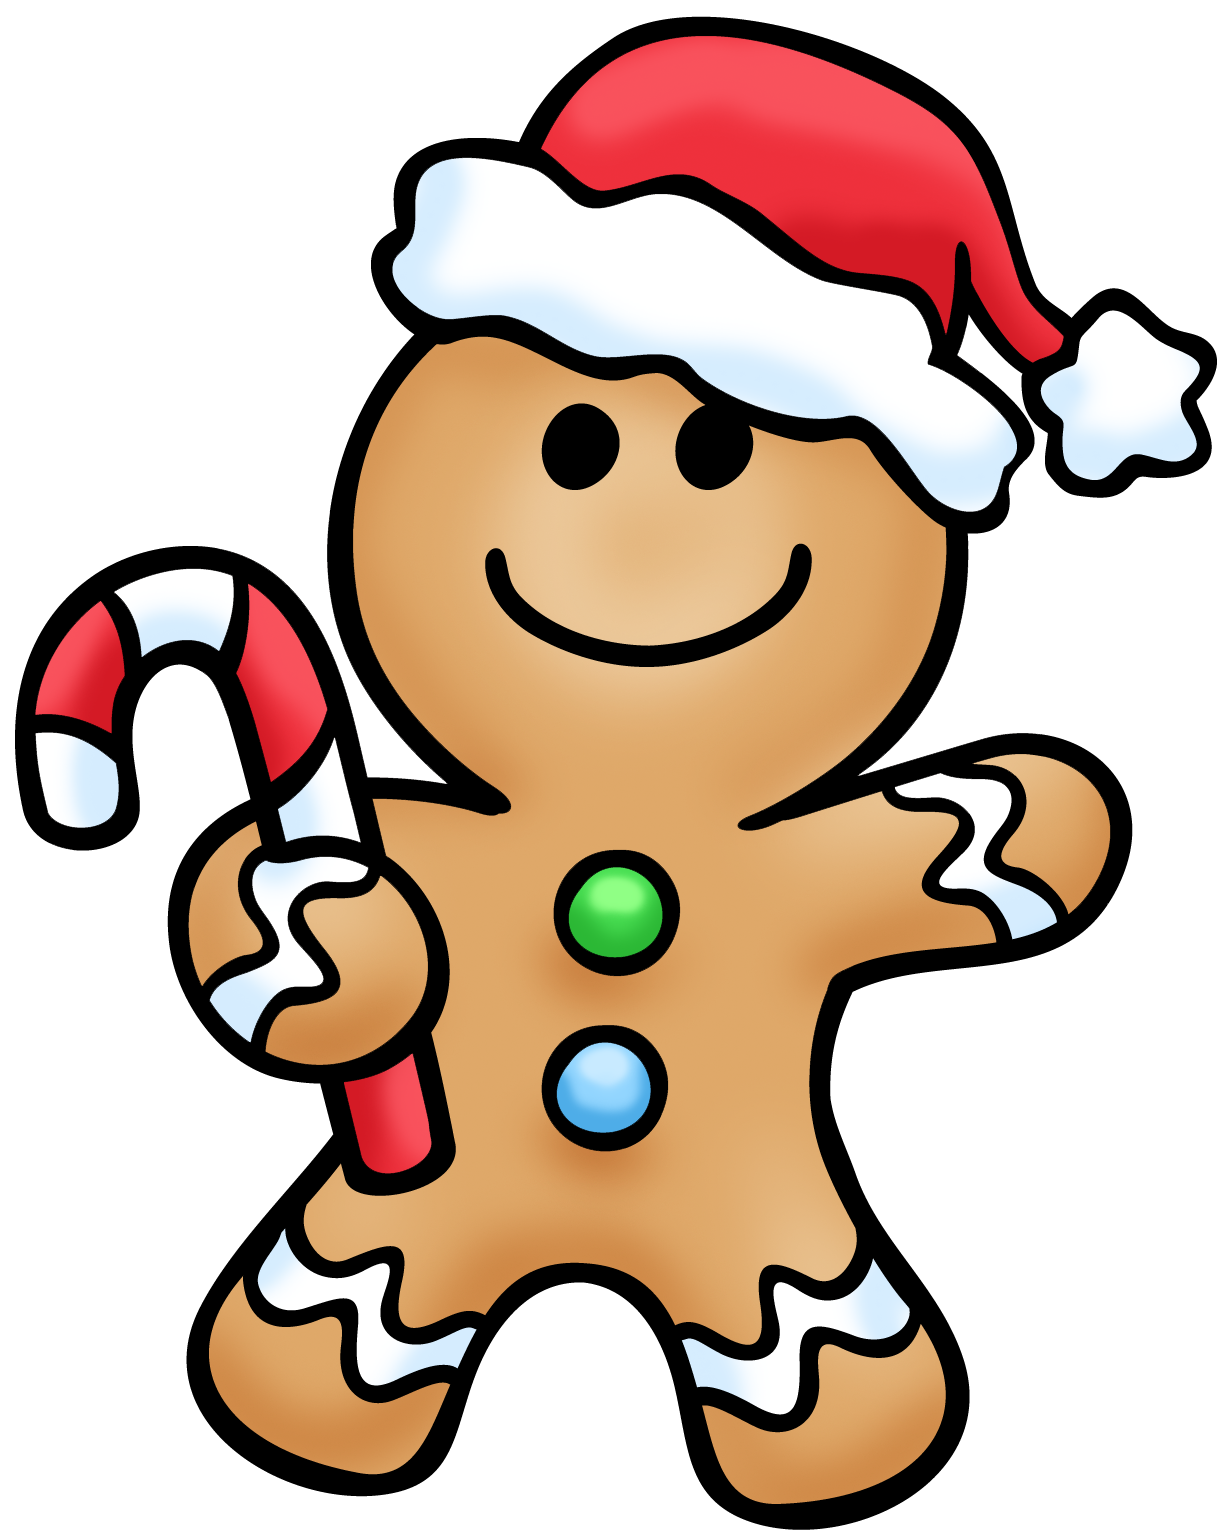 Door clipart gingerbread. Ginger bread man drawing